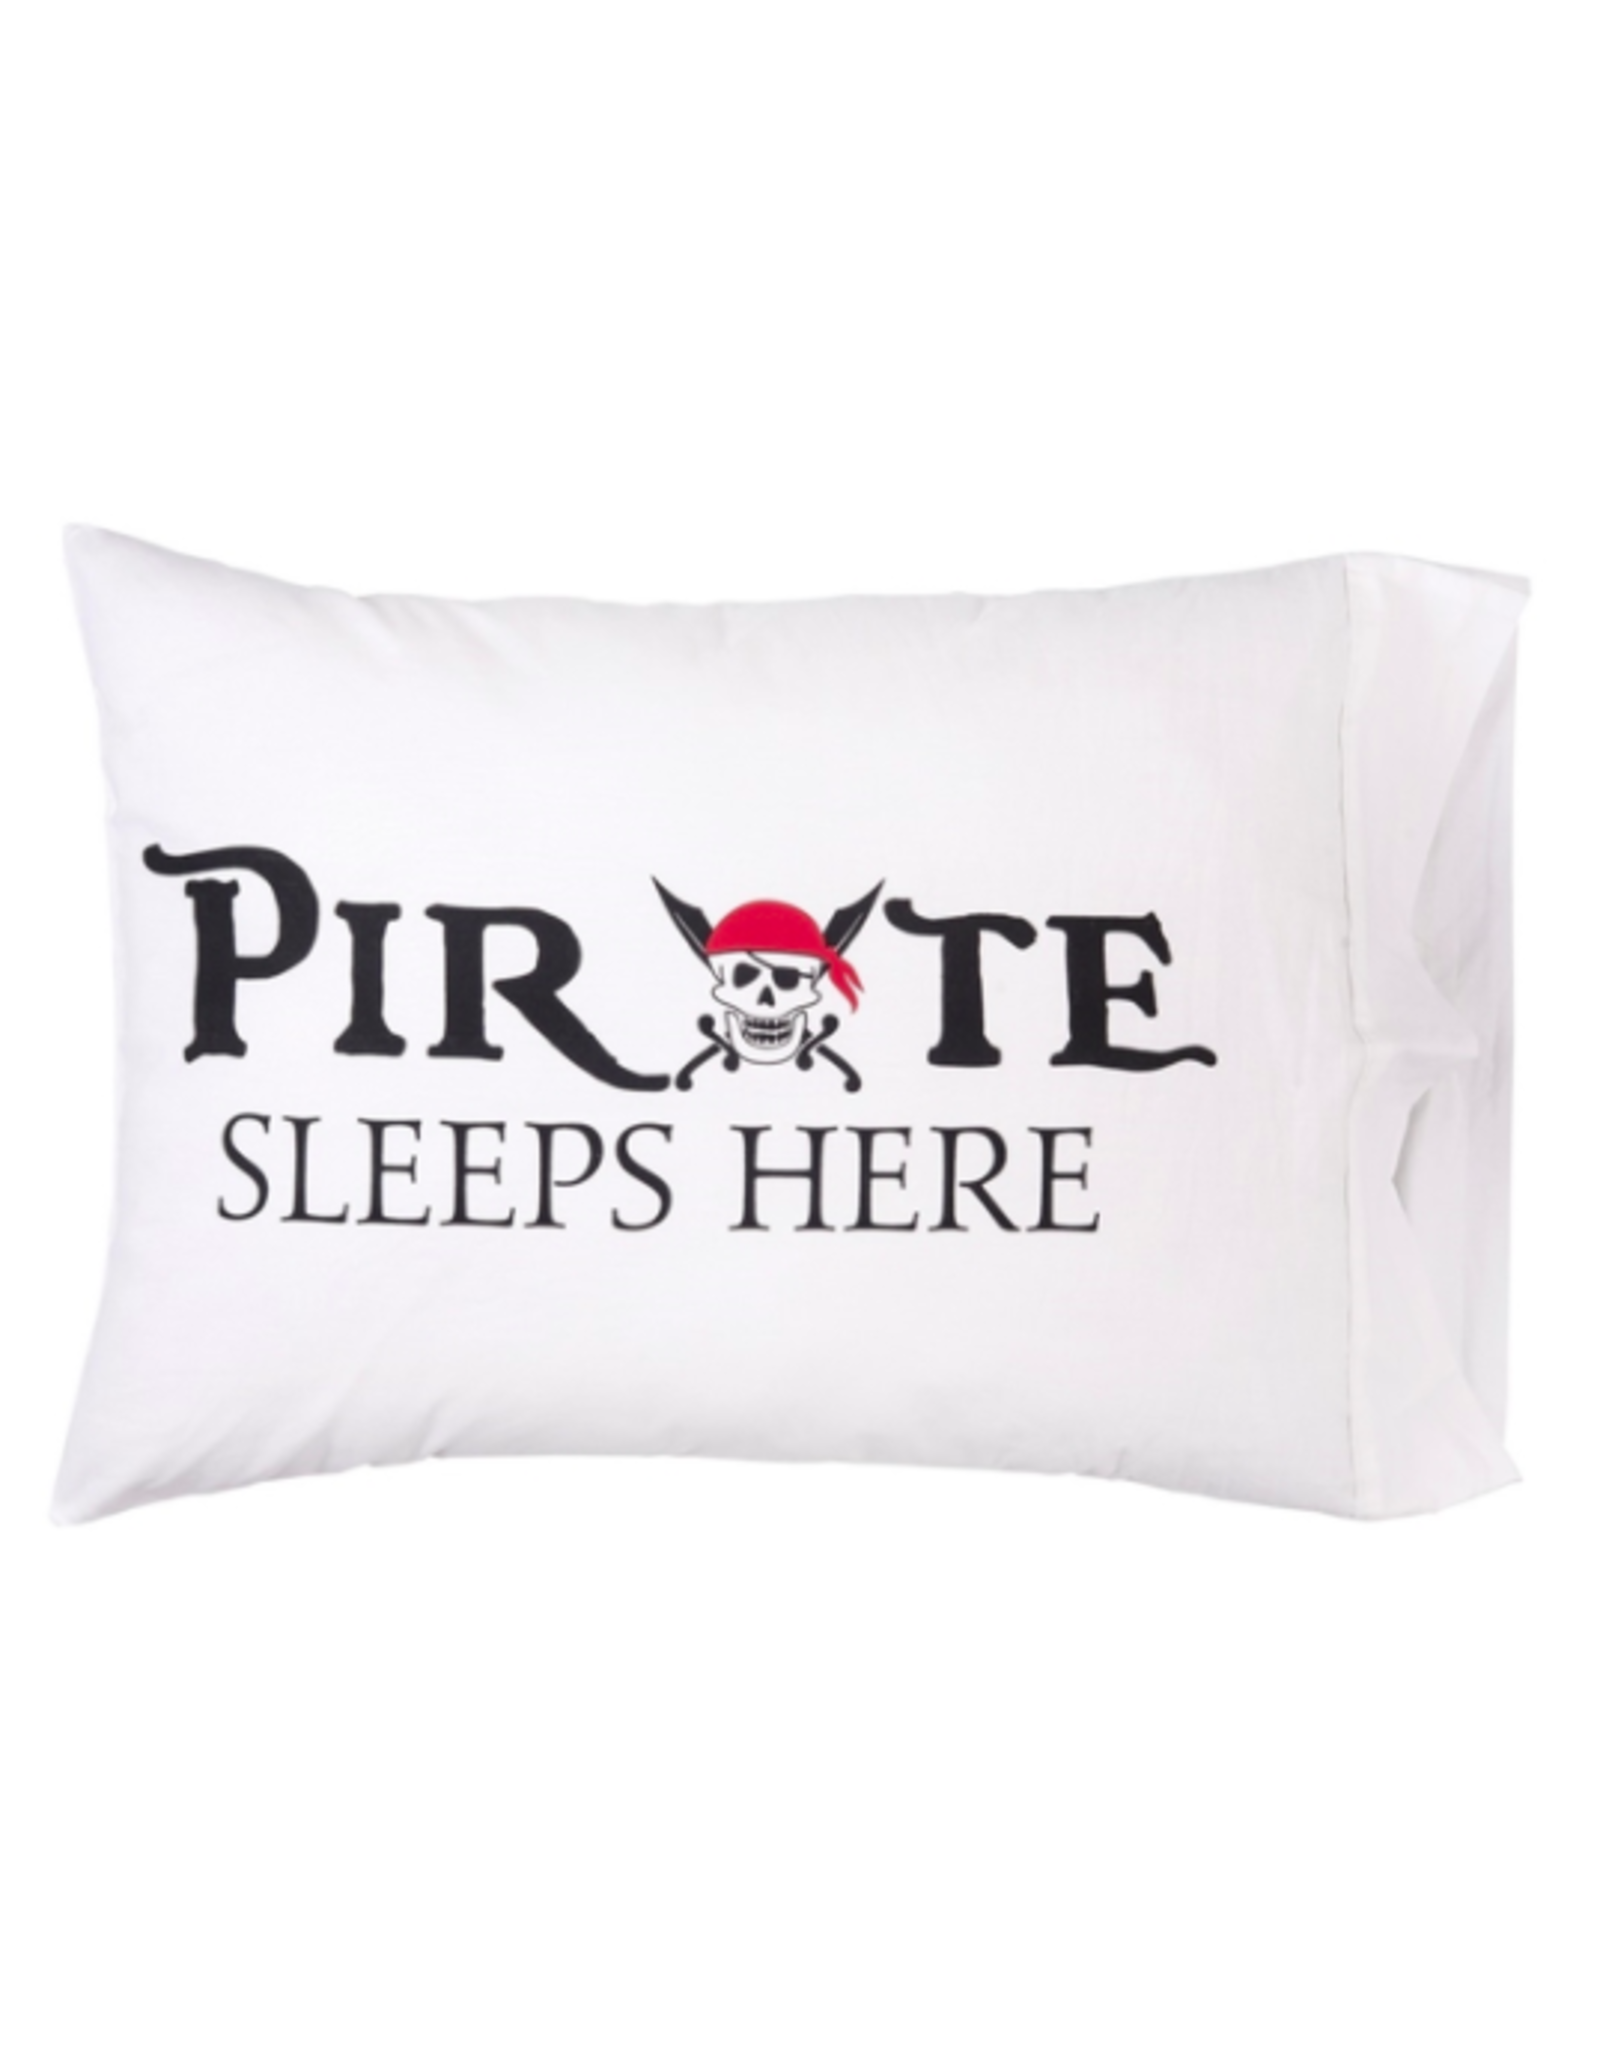 C&F Enterprises Pirate Sleeps Here Pillowcase